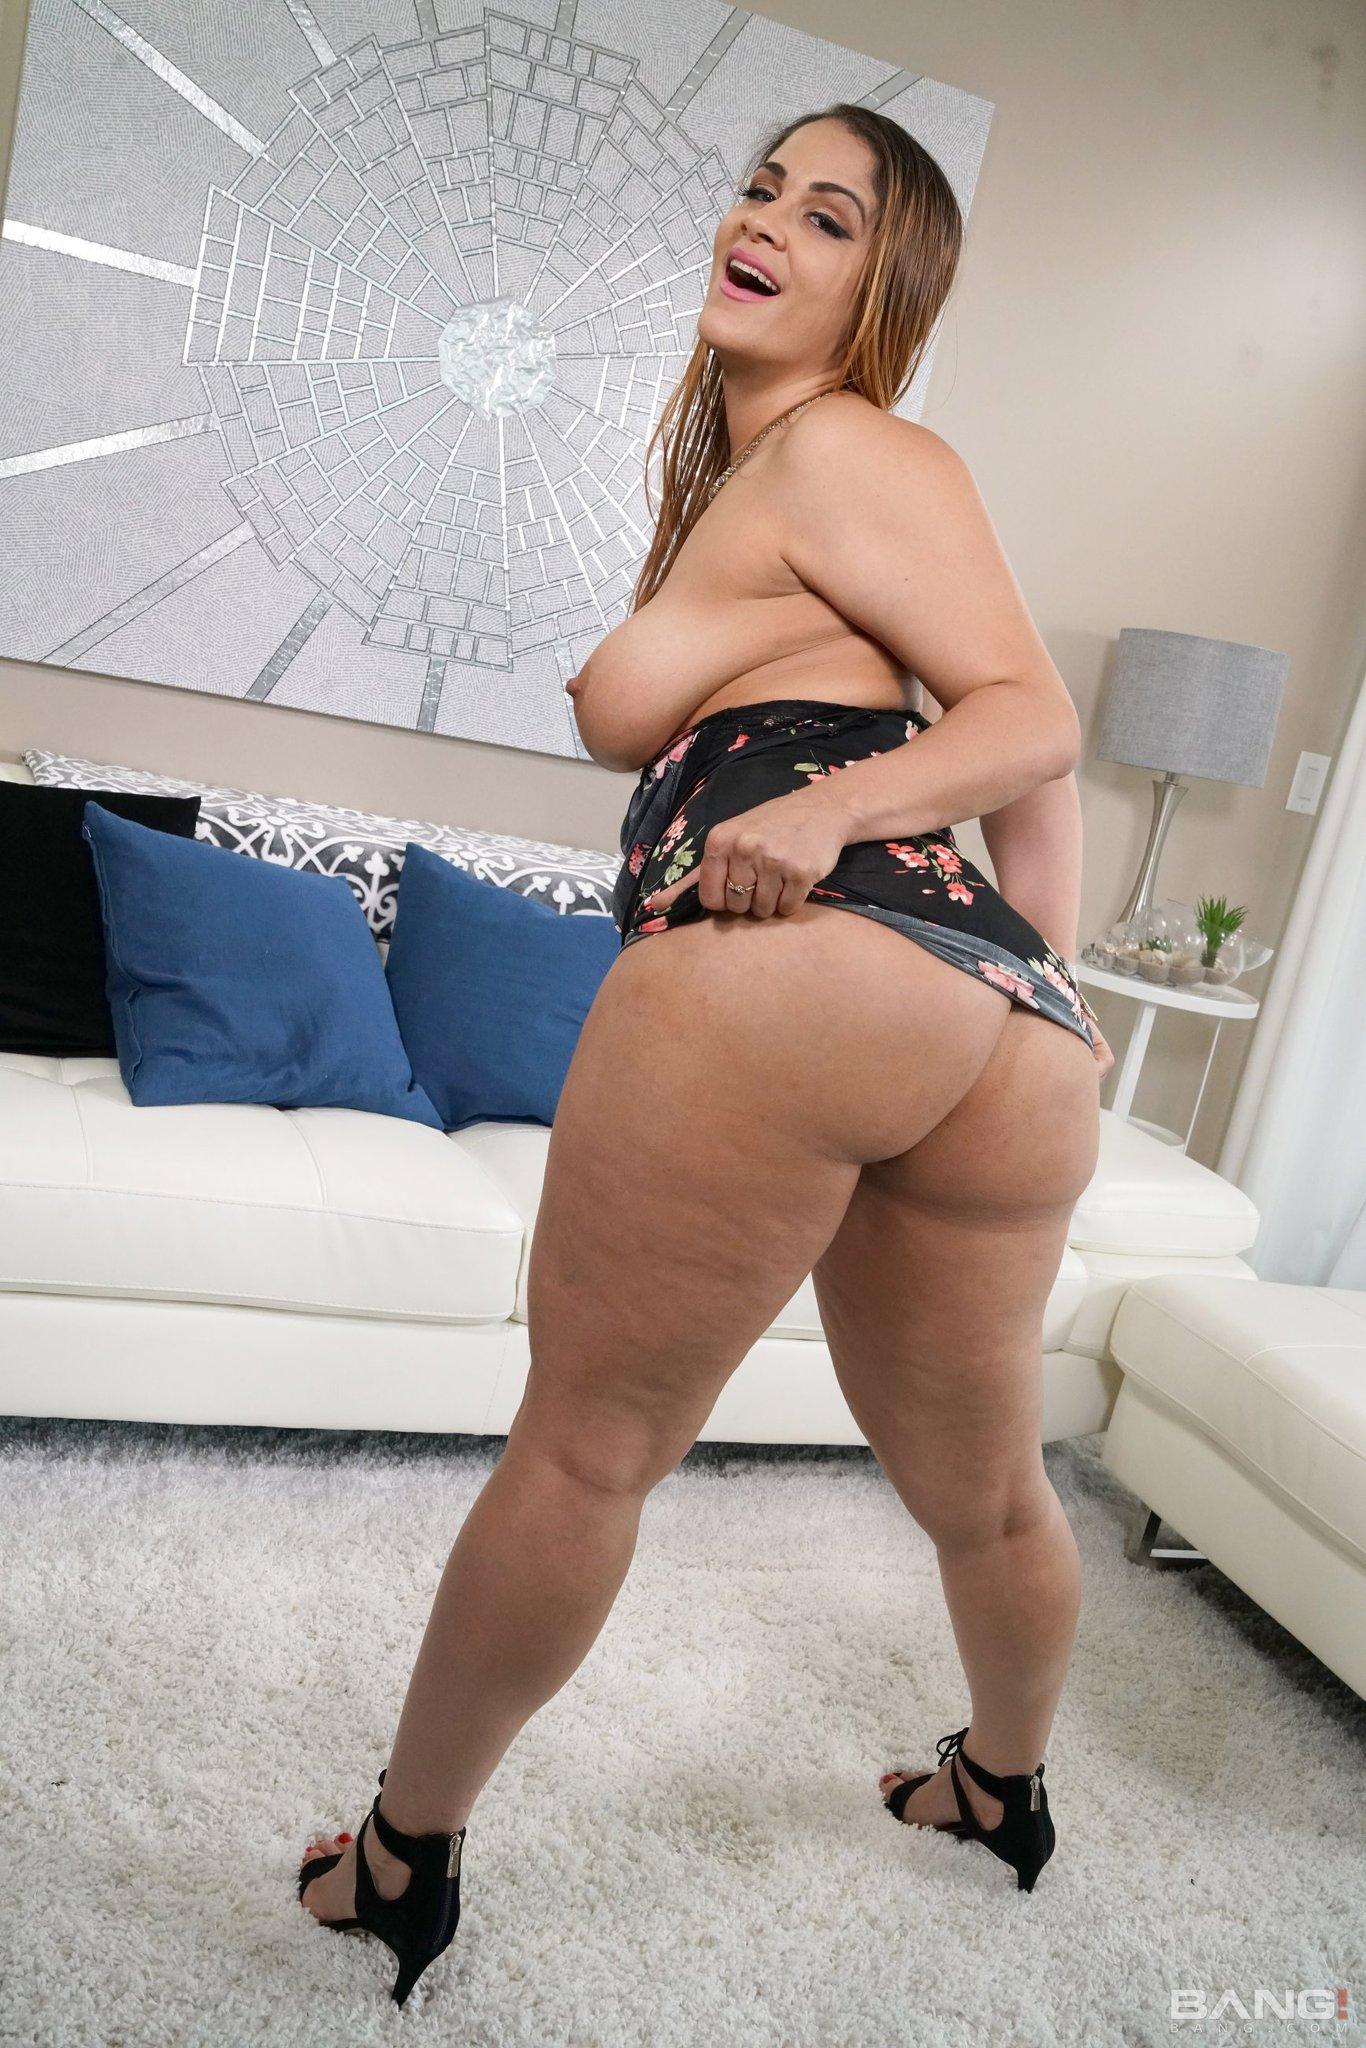 Miss raquel xxx Babe Source On Twitter Missraquel4x Miss Raquel Bang Real Milfs Full Picture Gallery Https T Co Qwczdag4ez